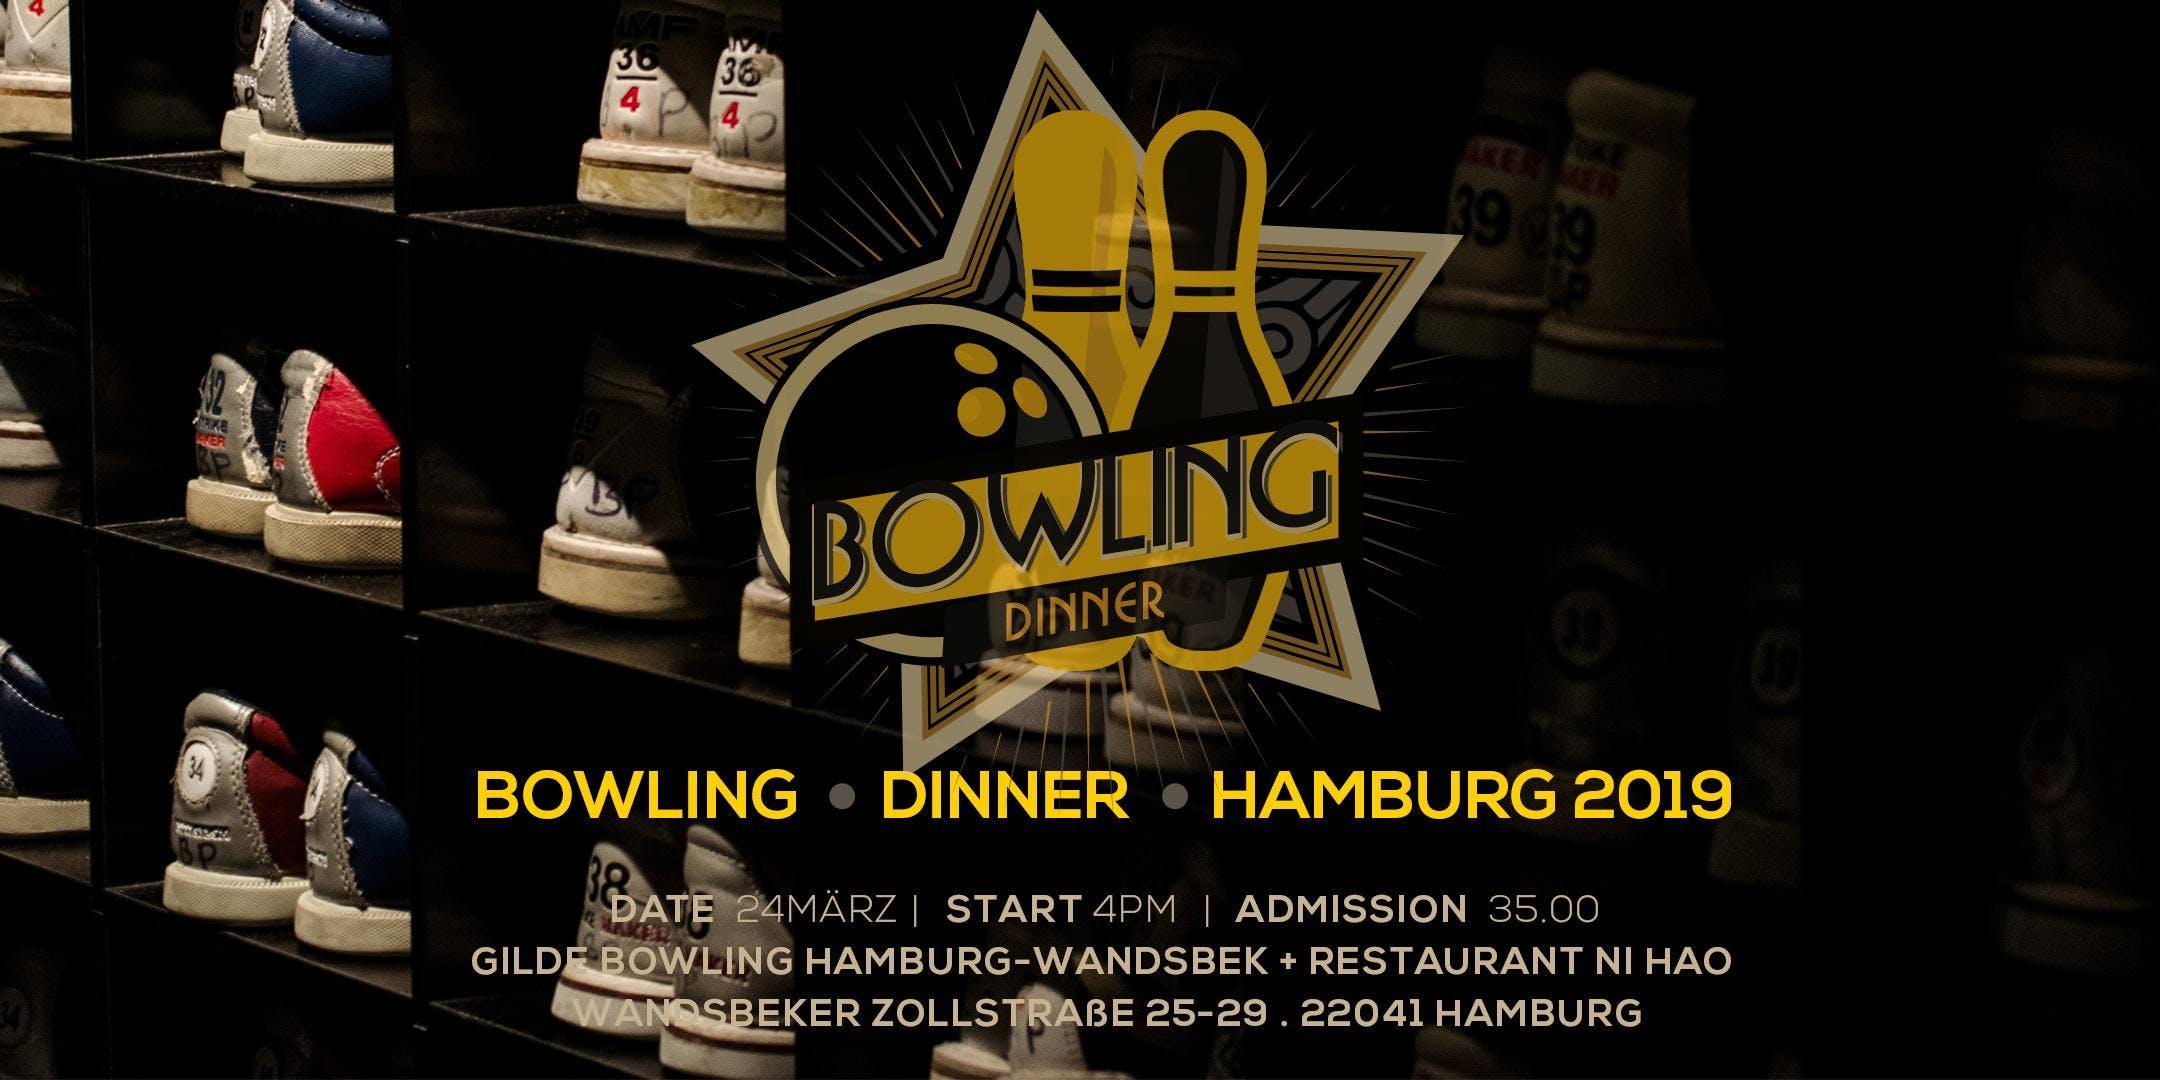 DINNER & BOWLING HAMBURG 2019